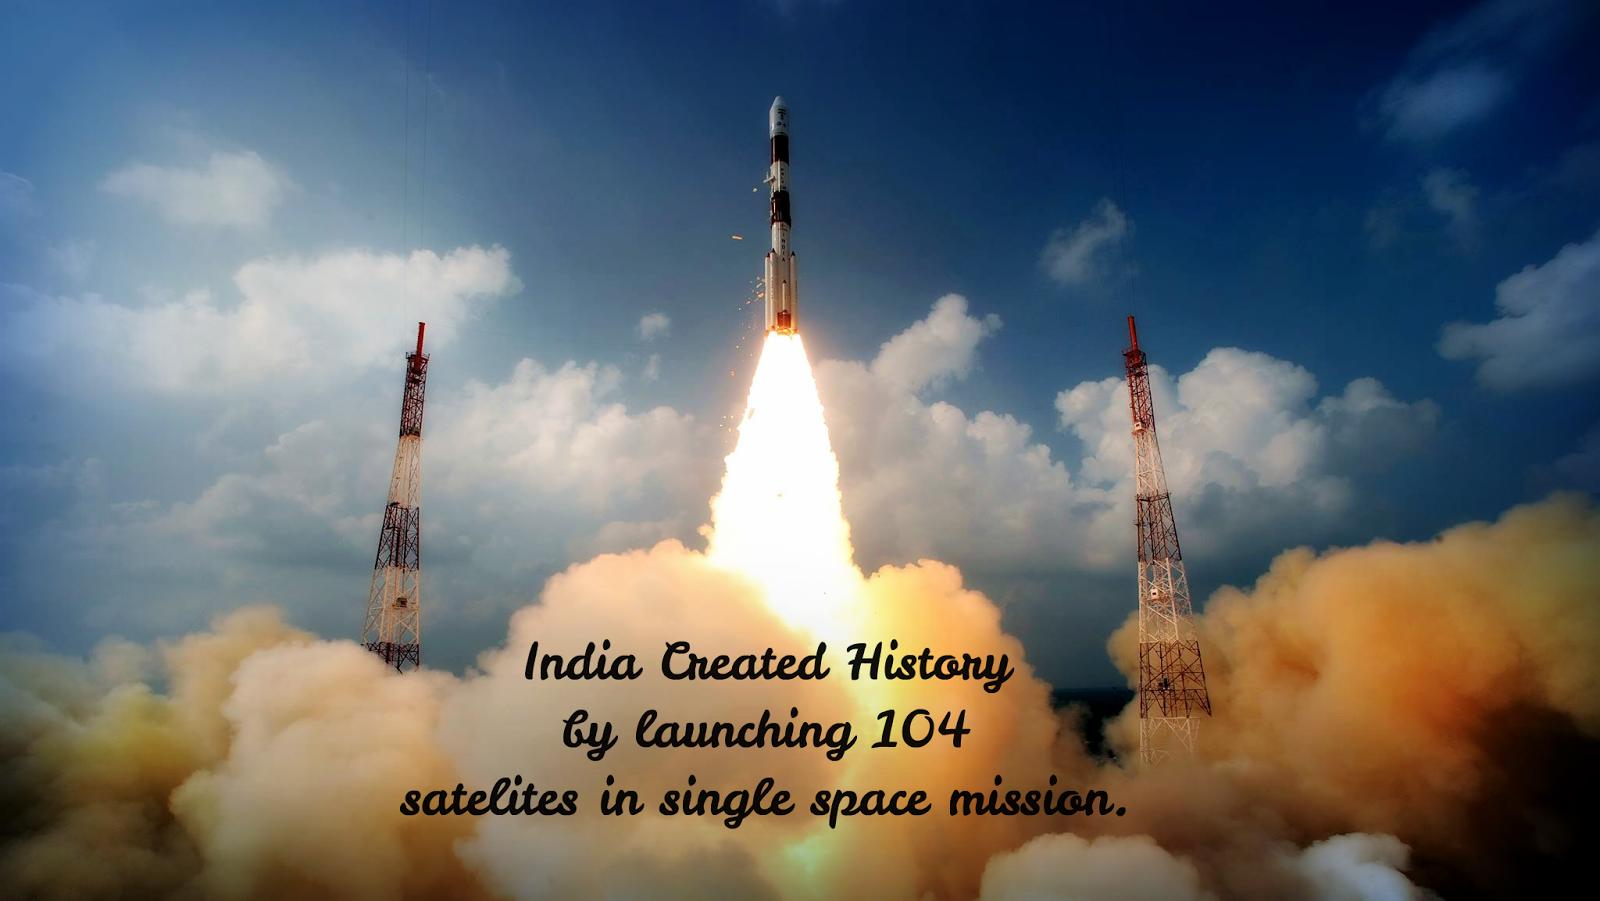 DevRN: India Created History: sent 104 satellites in single